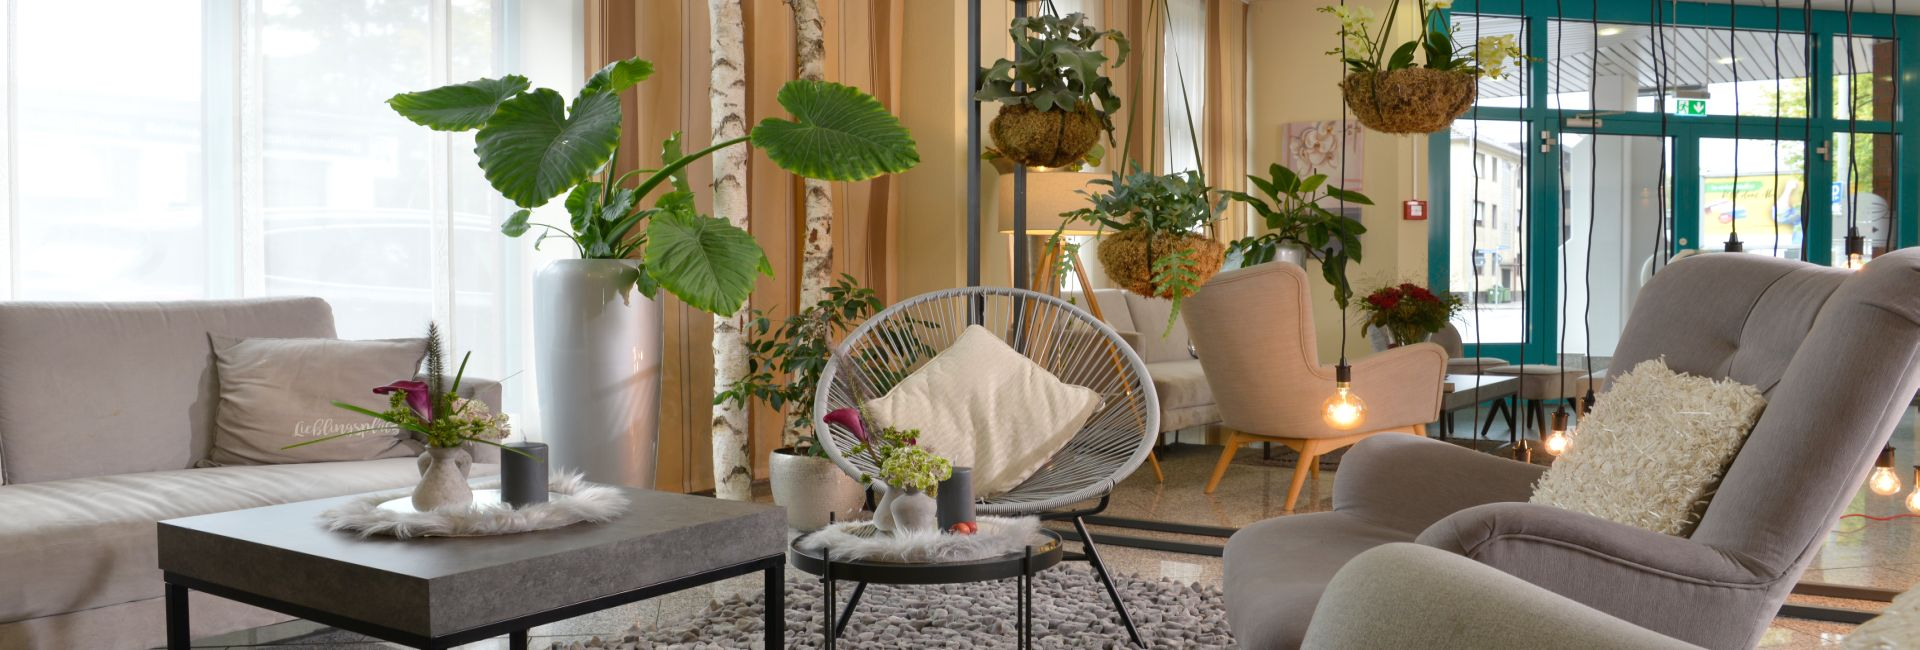 Hotelhalle Sitzecke mit Korbsessel